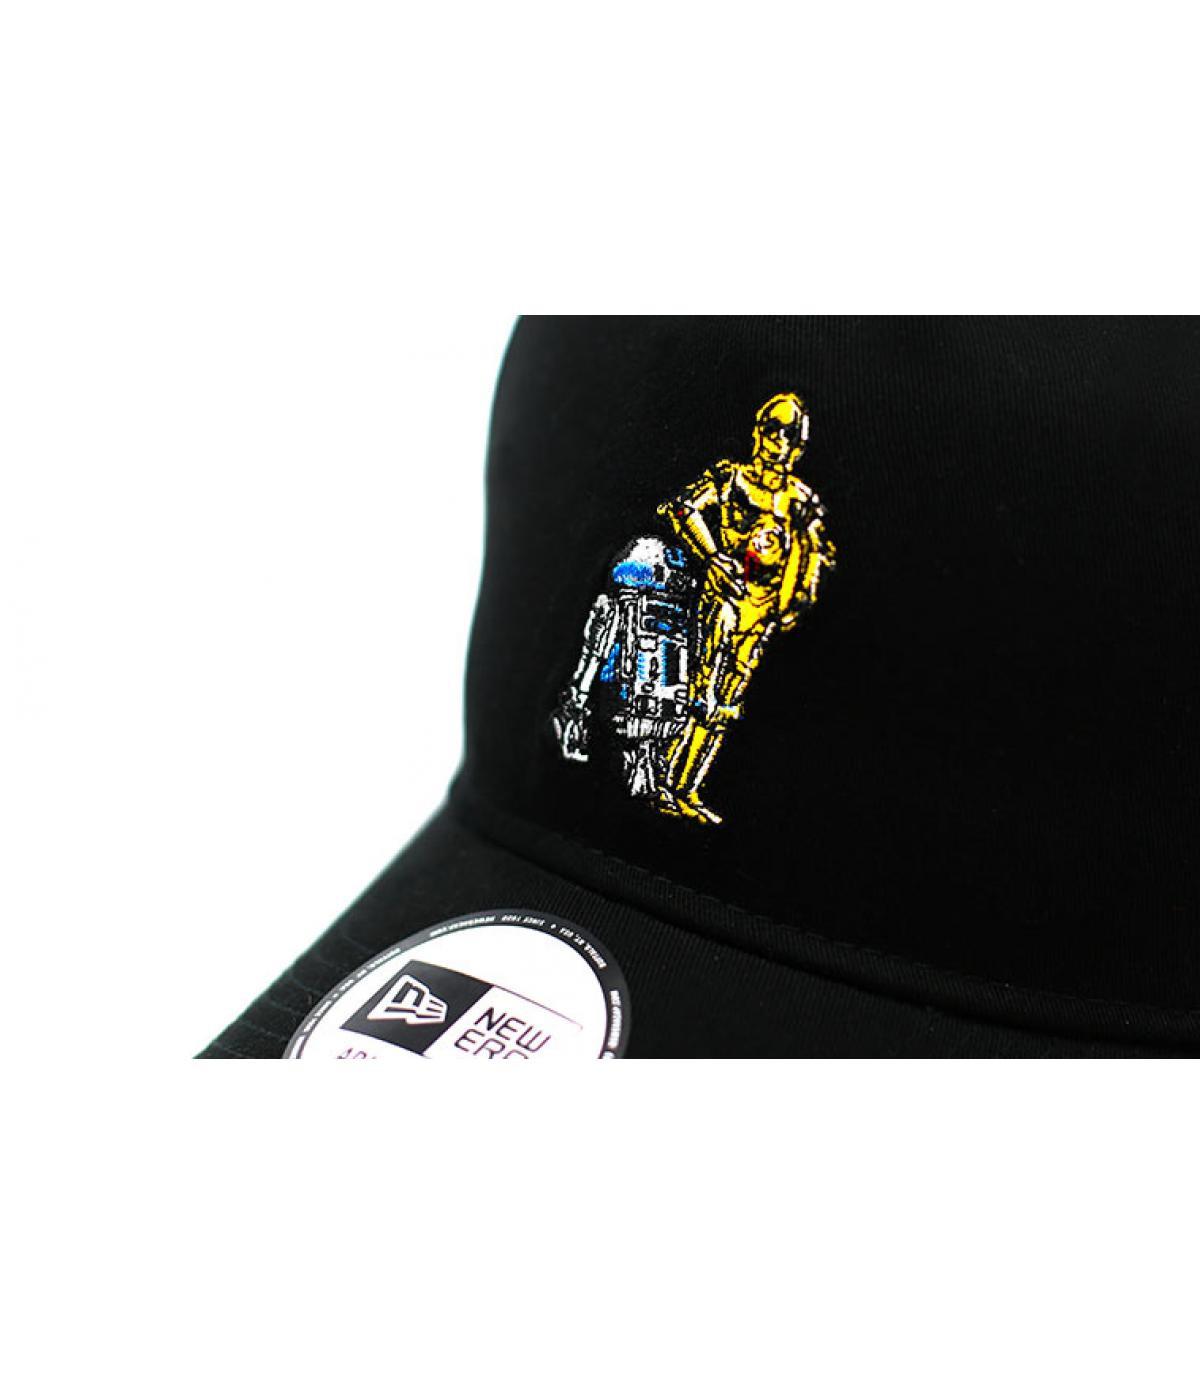 Dettagli Casquette Star Wars Droids 940 A Frame black - image 3